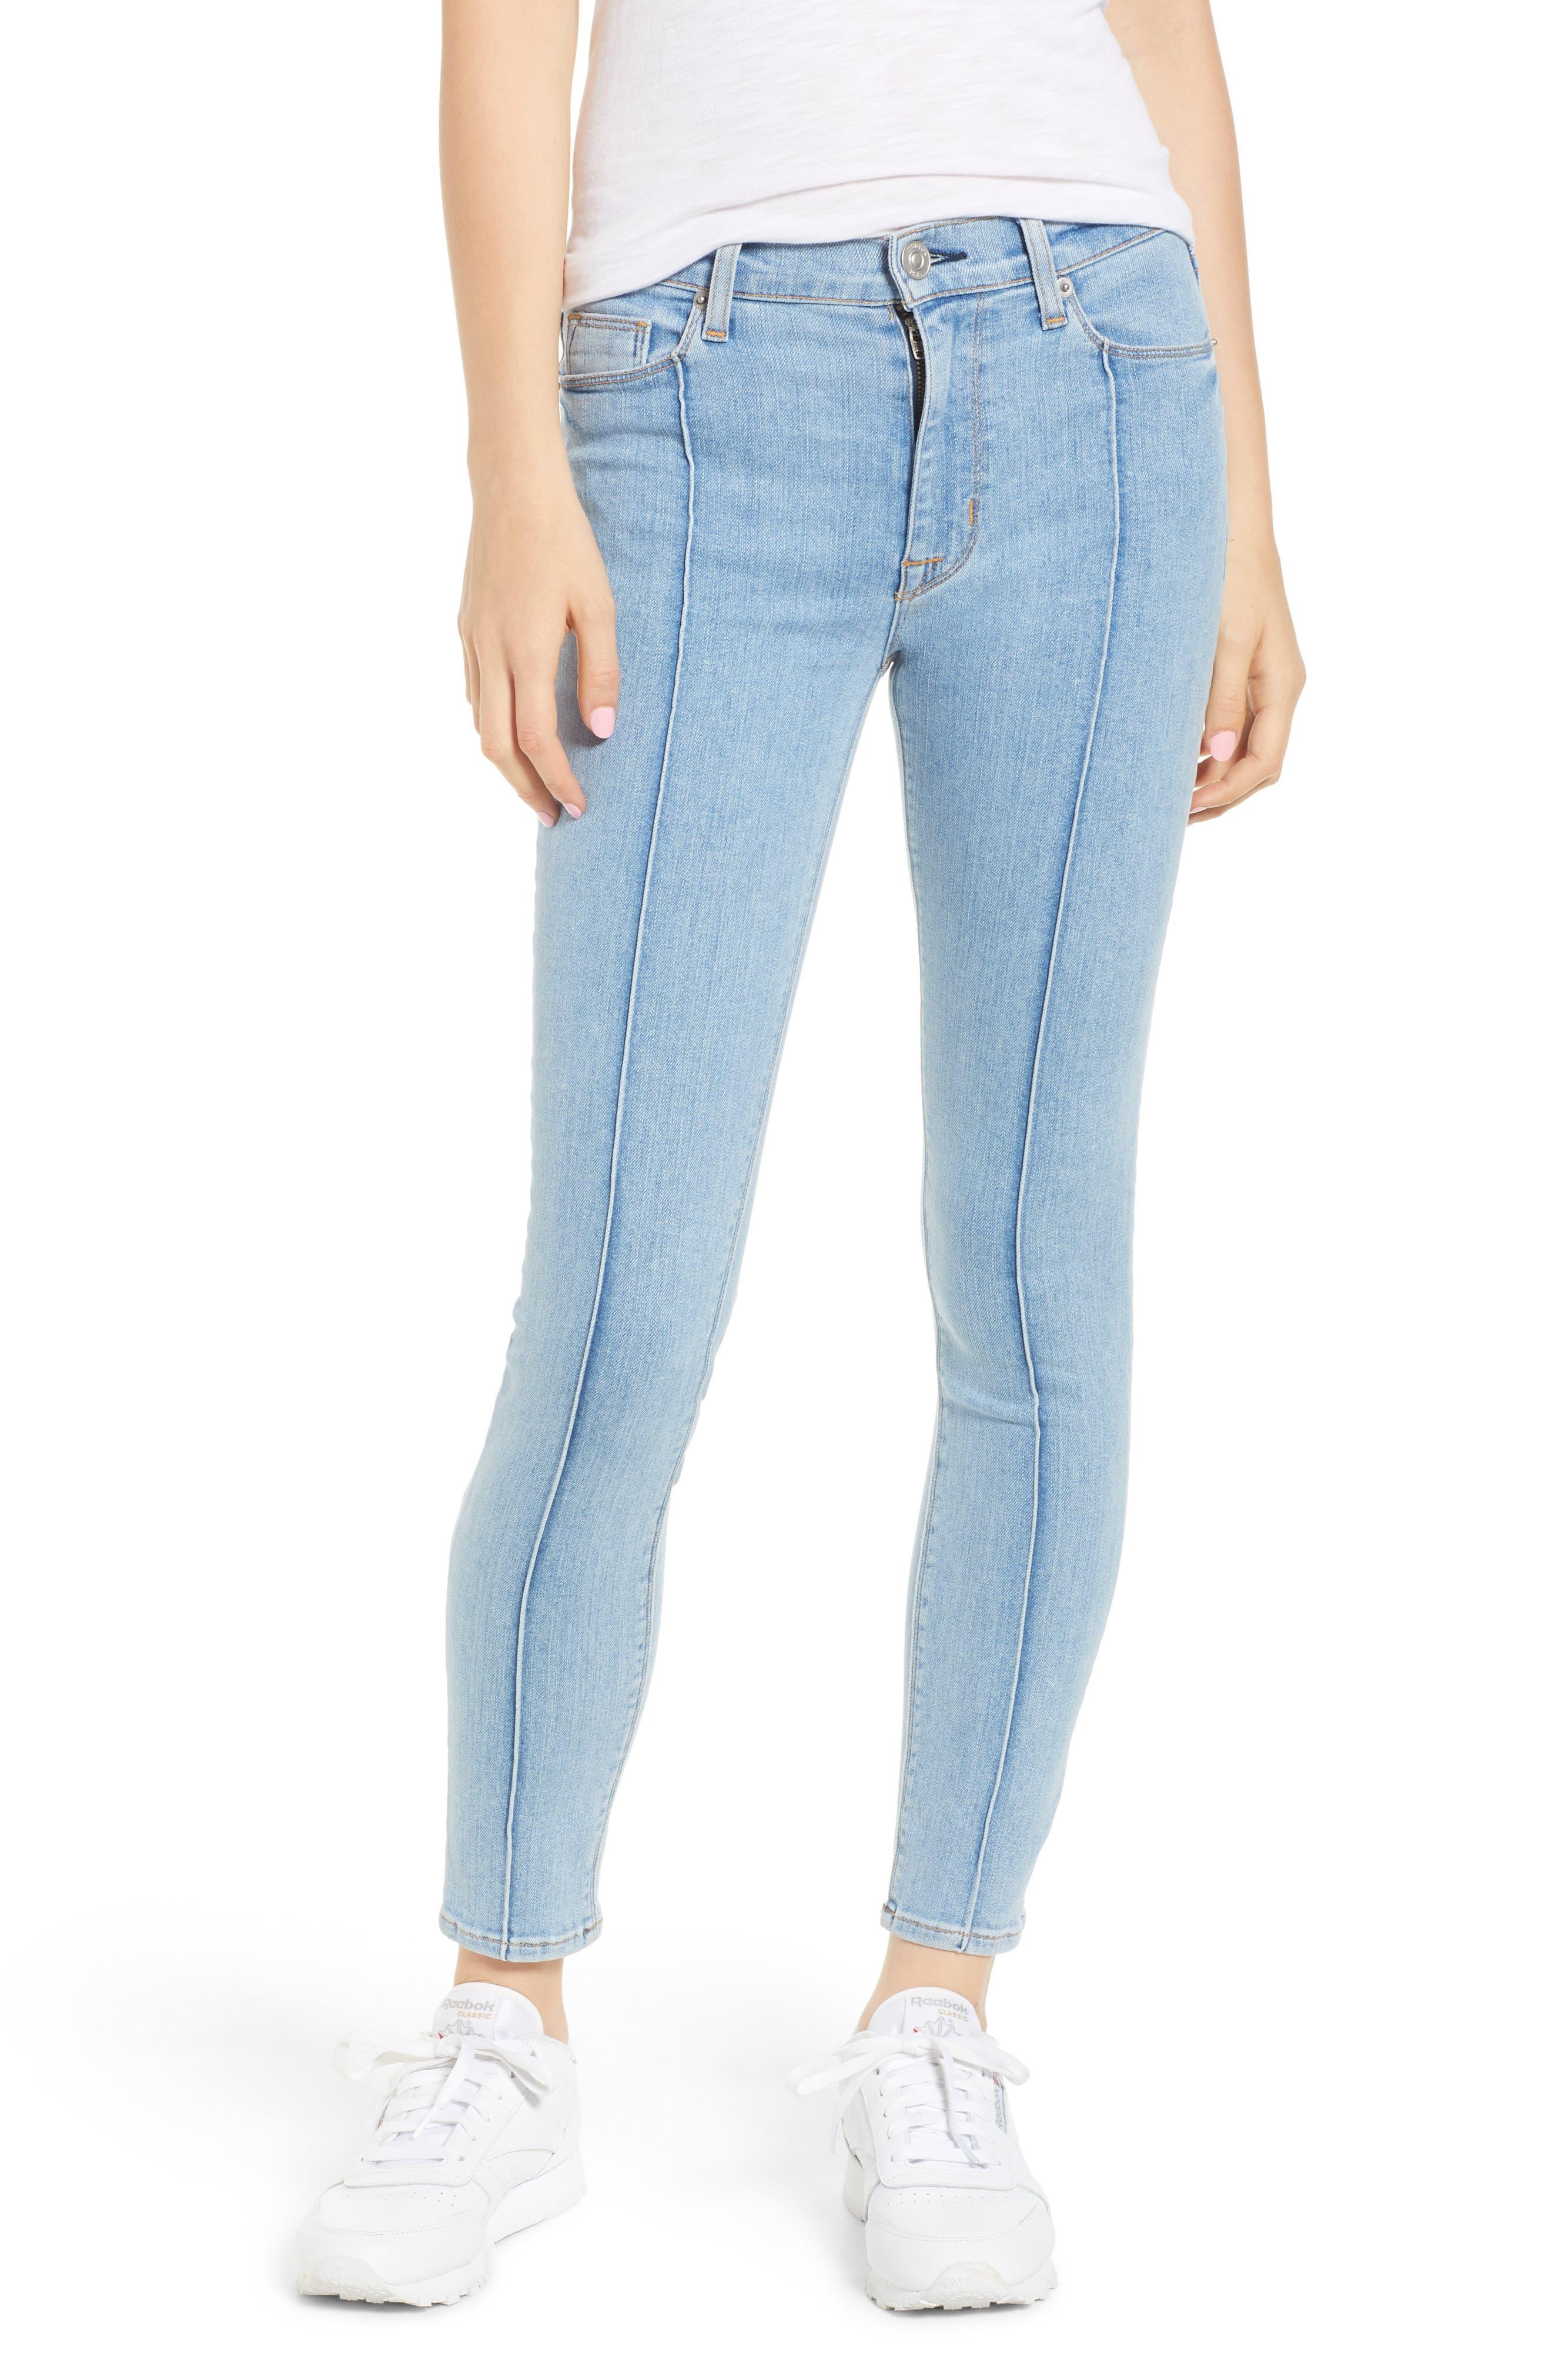 Barbara High Waist Super Skinny Jeans,                         Main,                         color, Nymph